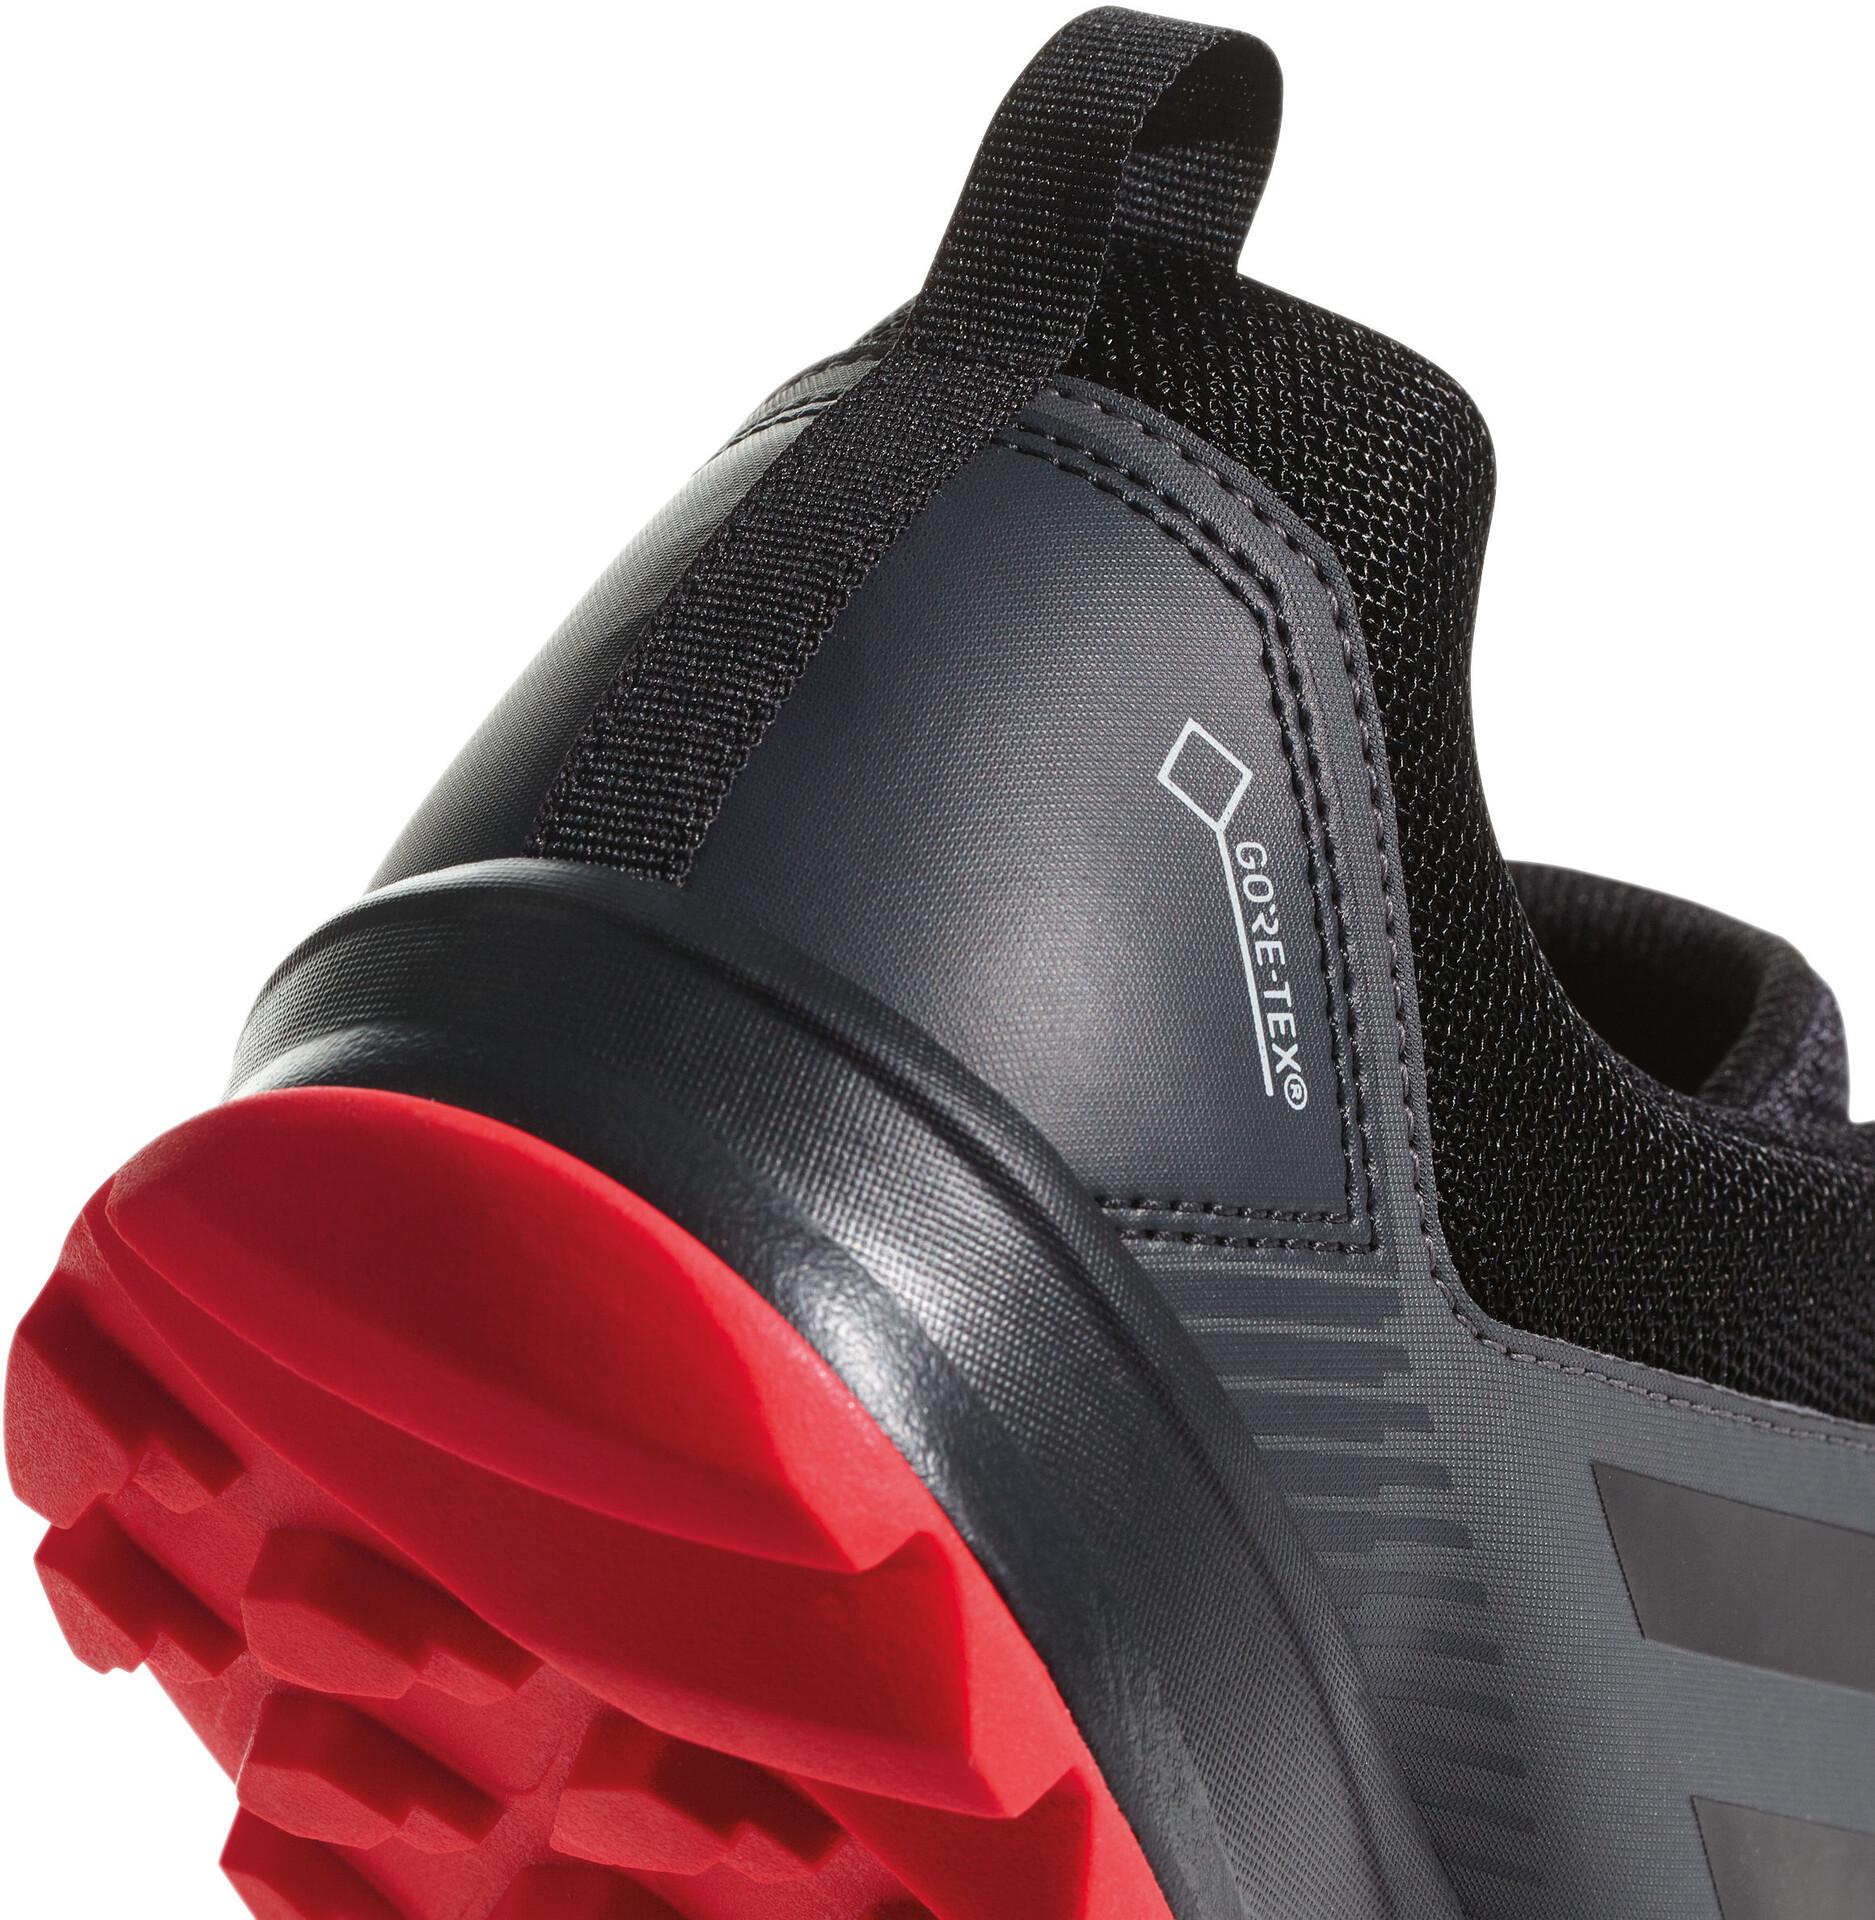 Adidas terrex tracerocker gtx scarpe da corsa uomini grigi a